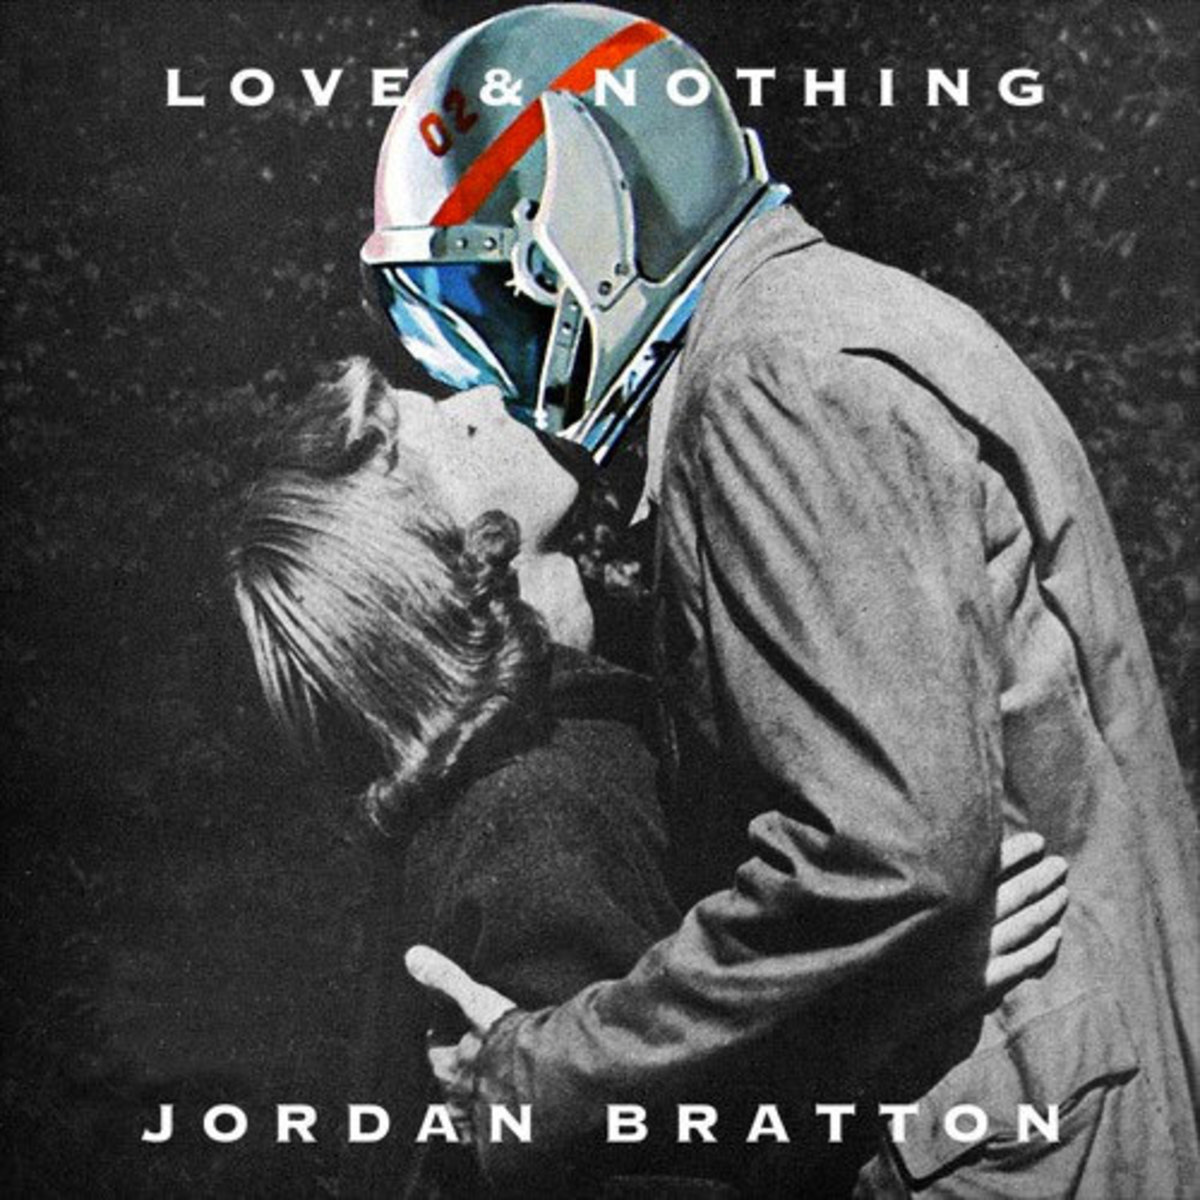 jordan-bratton-love-and-nothing.jpg